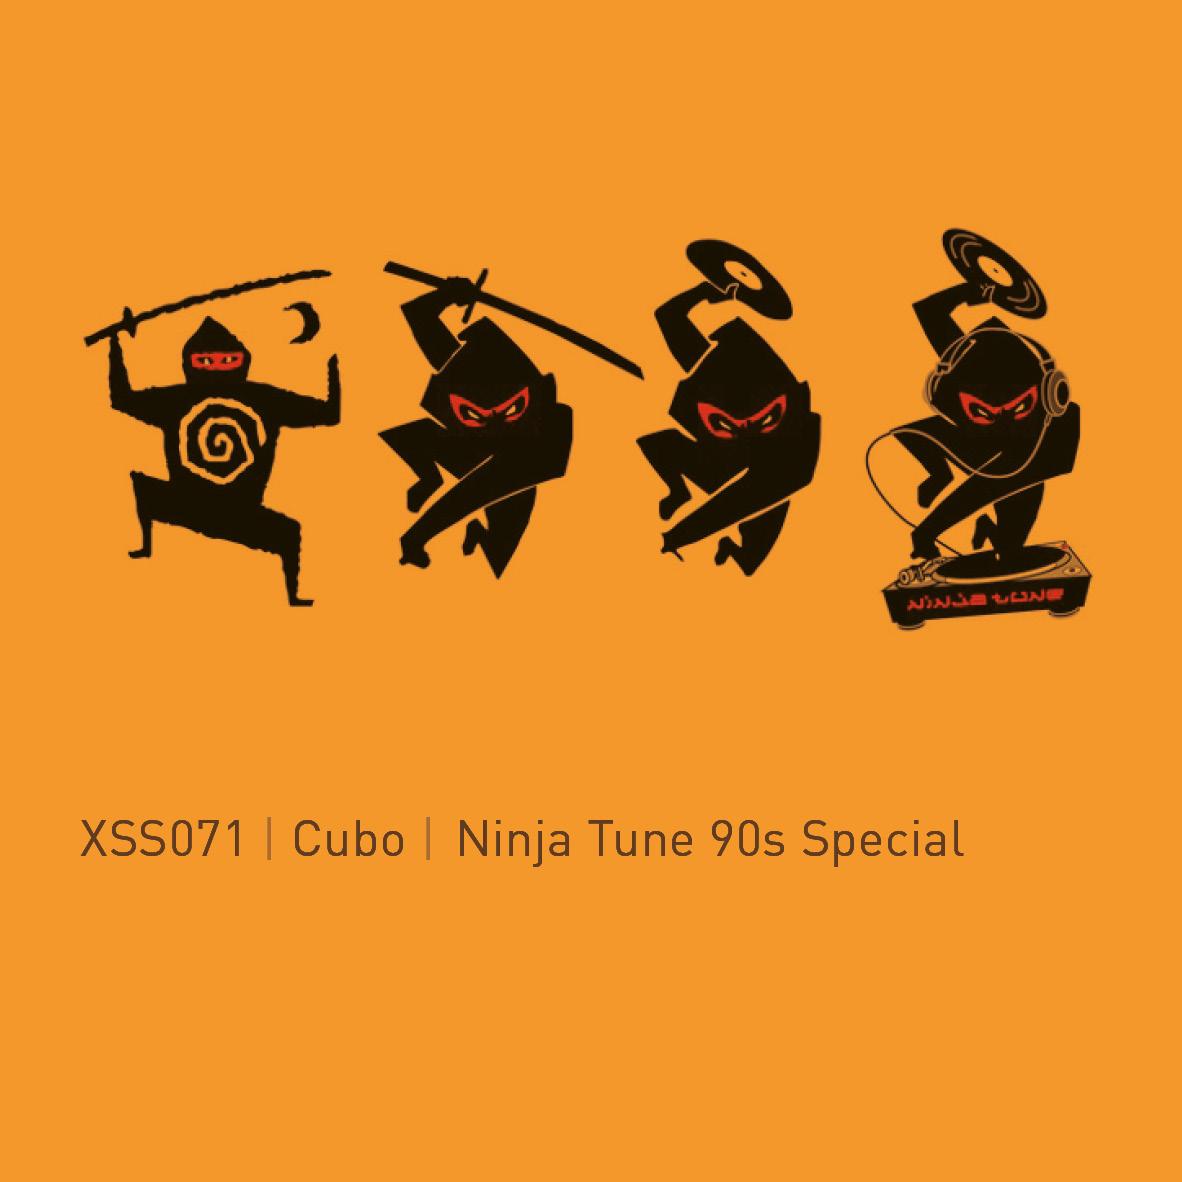 XSS071 | Cubo | Ninja Tune 90s Special